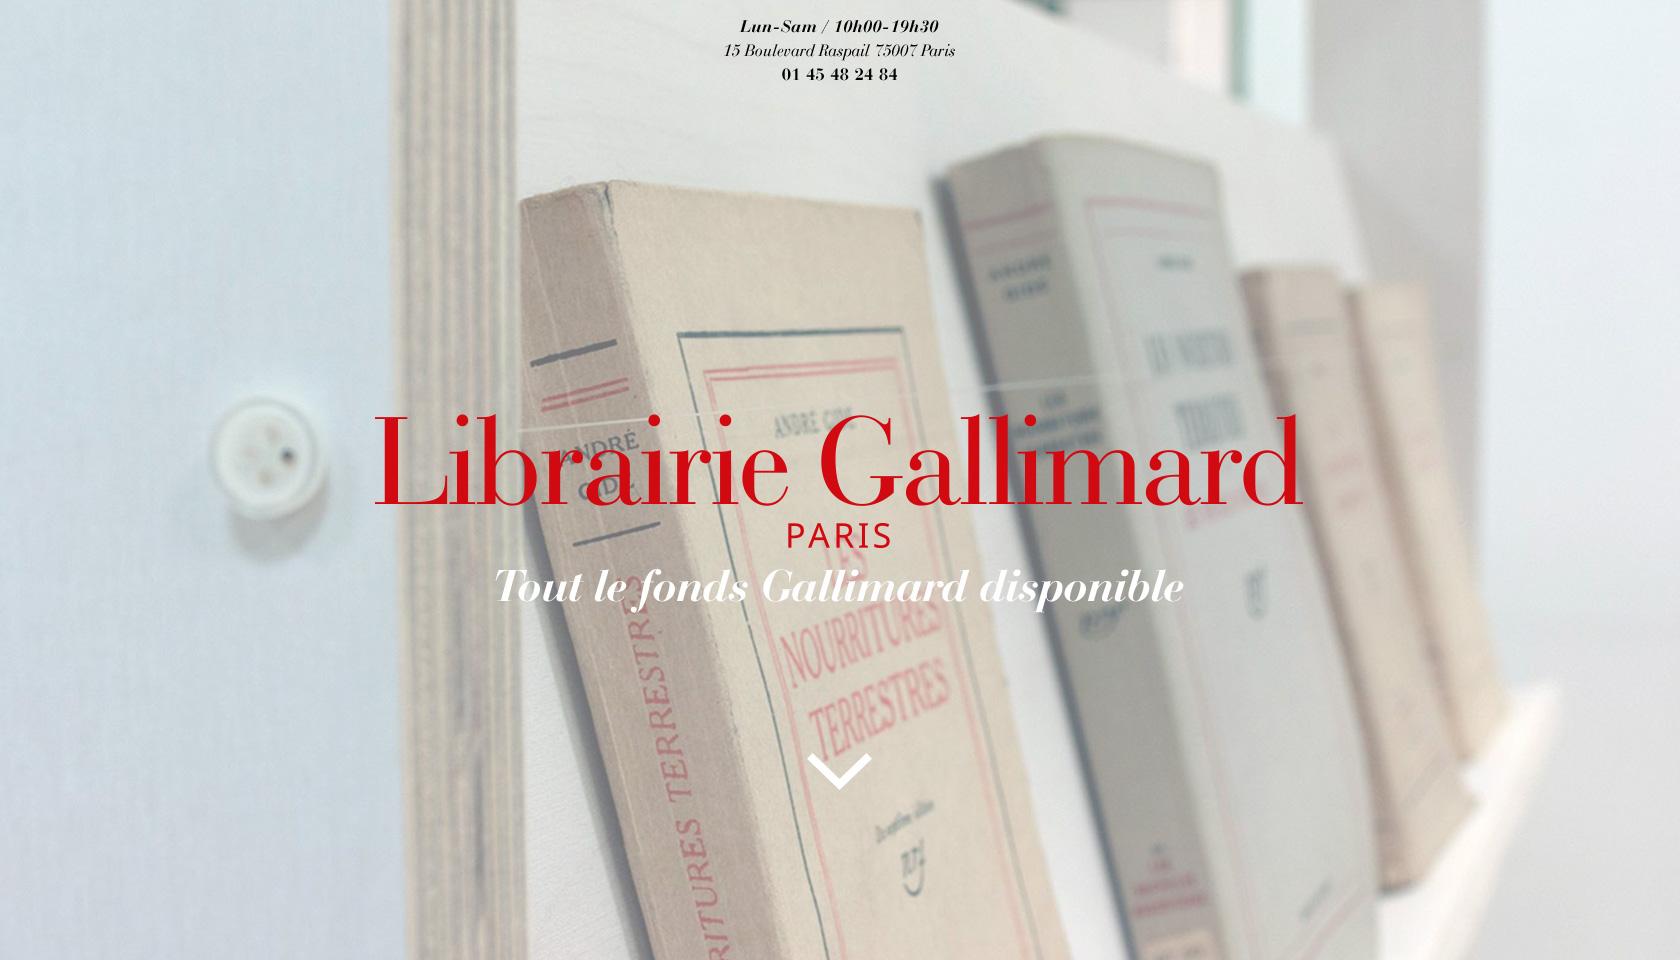 Librairie Gallimard, Paris